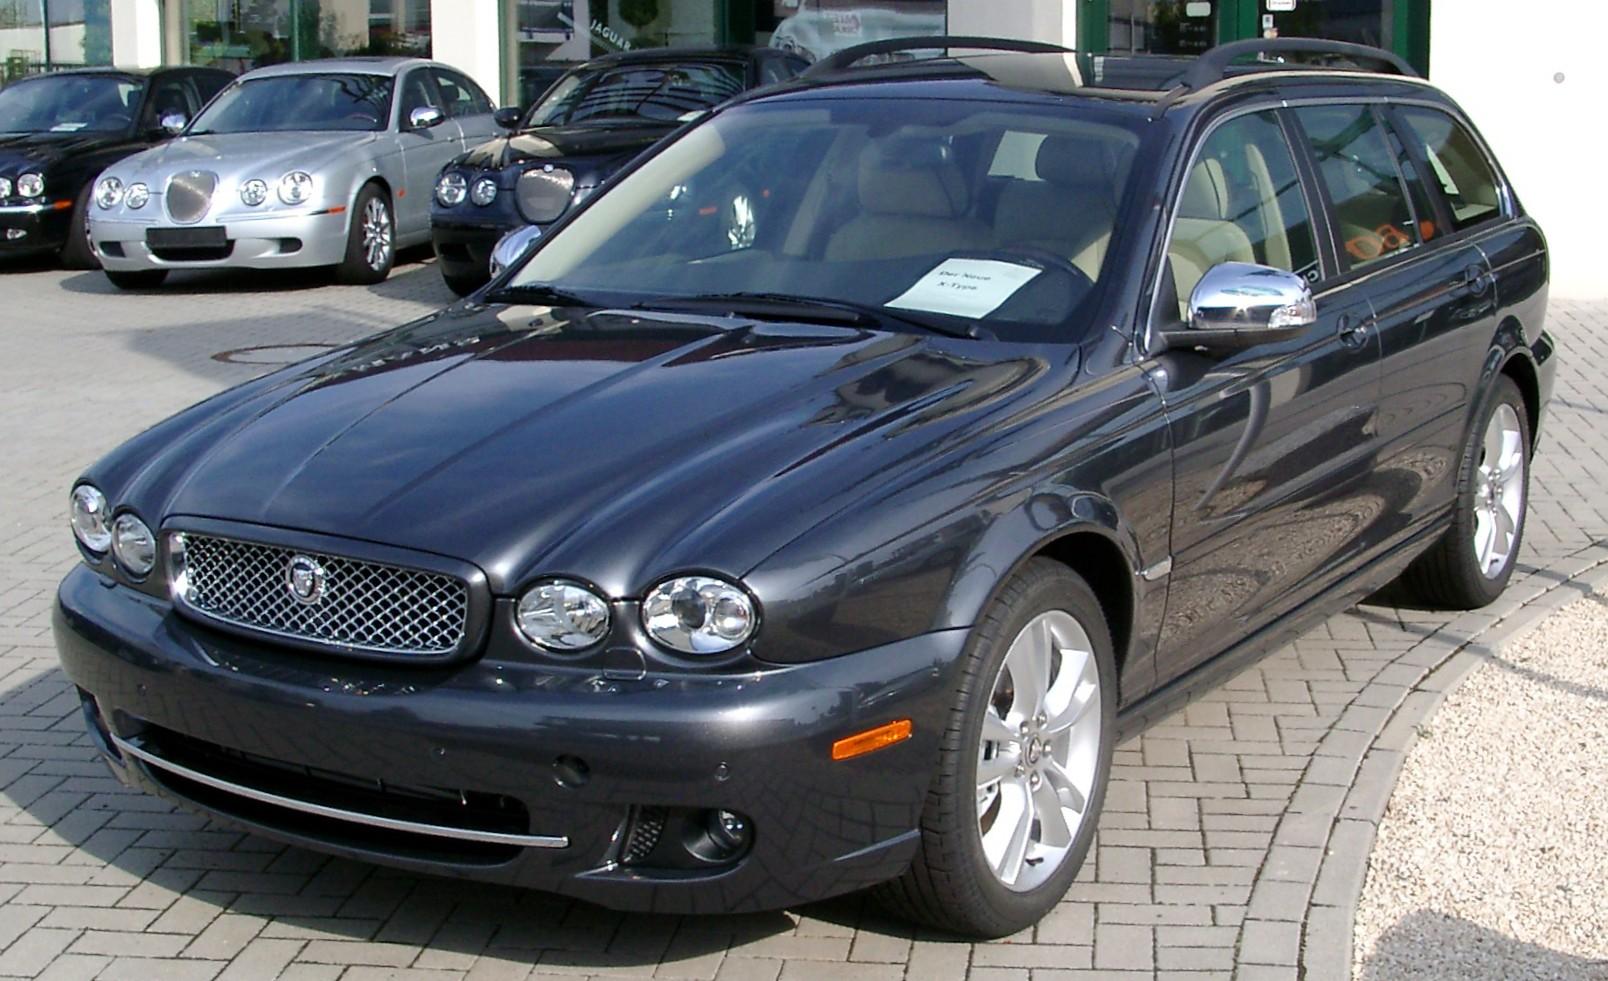 2005 jaguar x-type - information and photos - zombiedrive